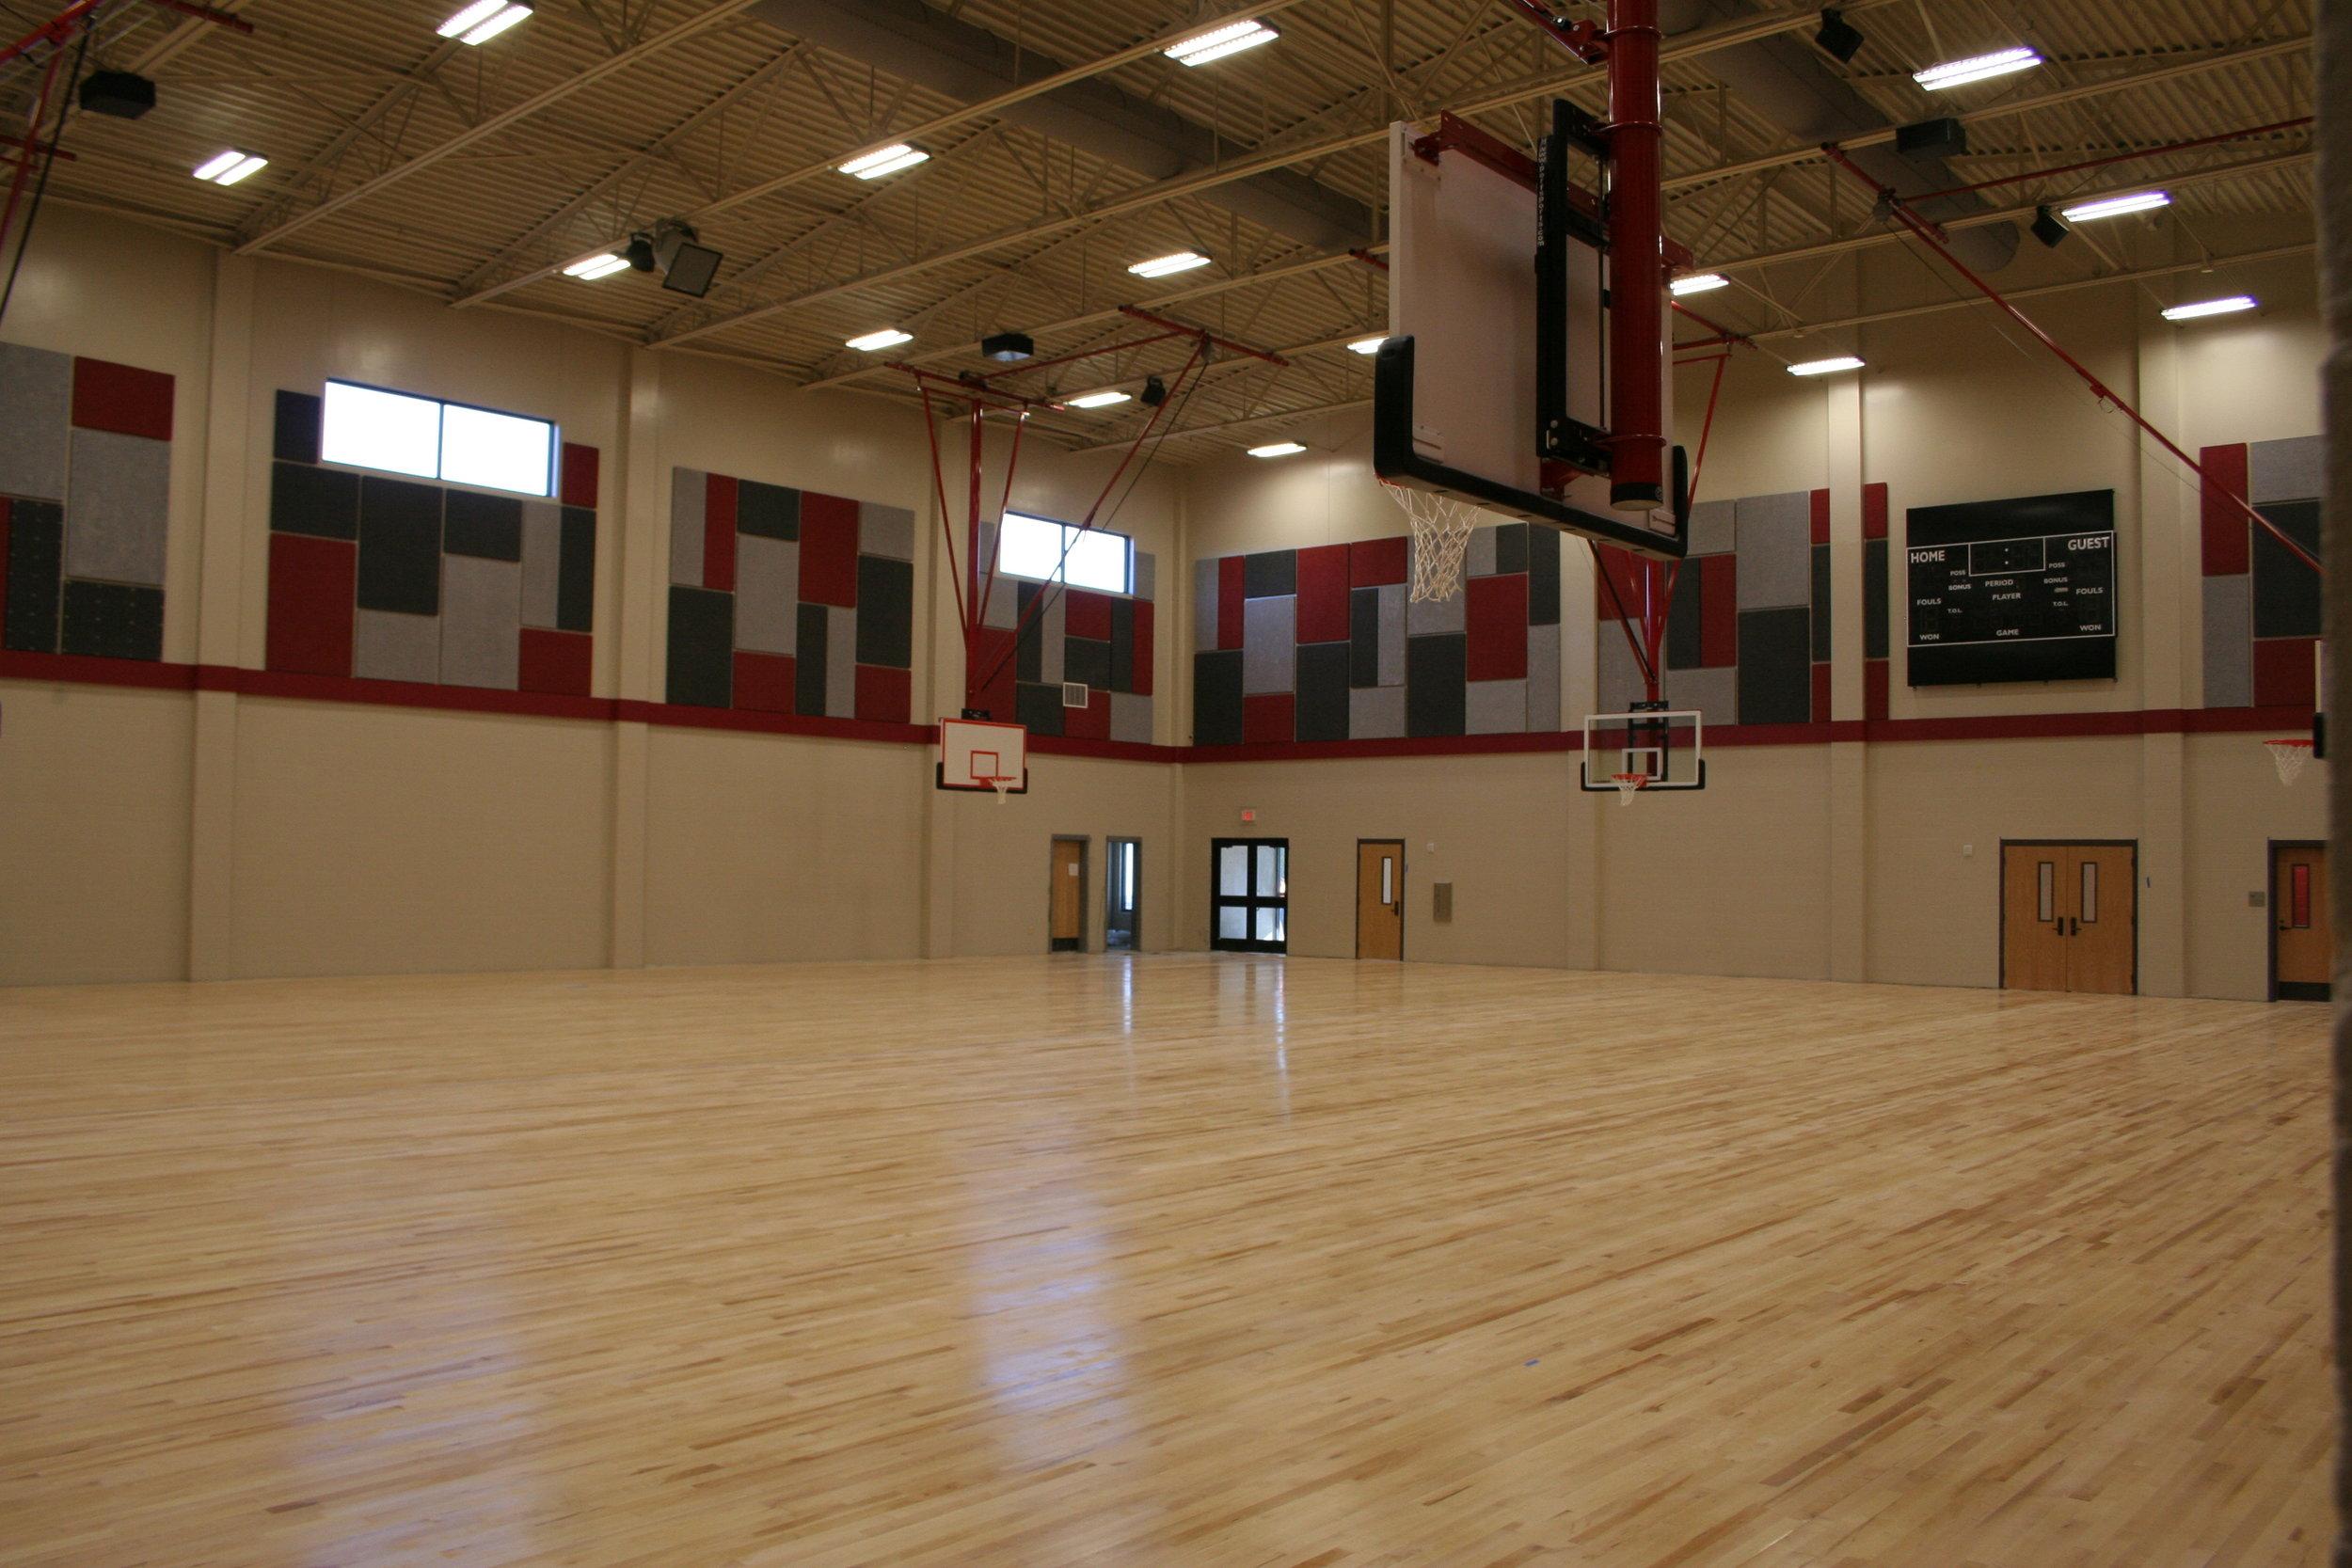 Gym Interior #1.JPG